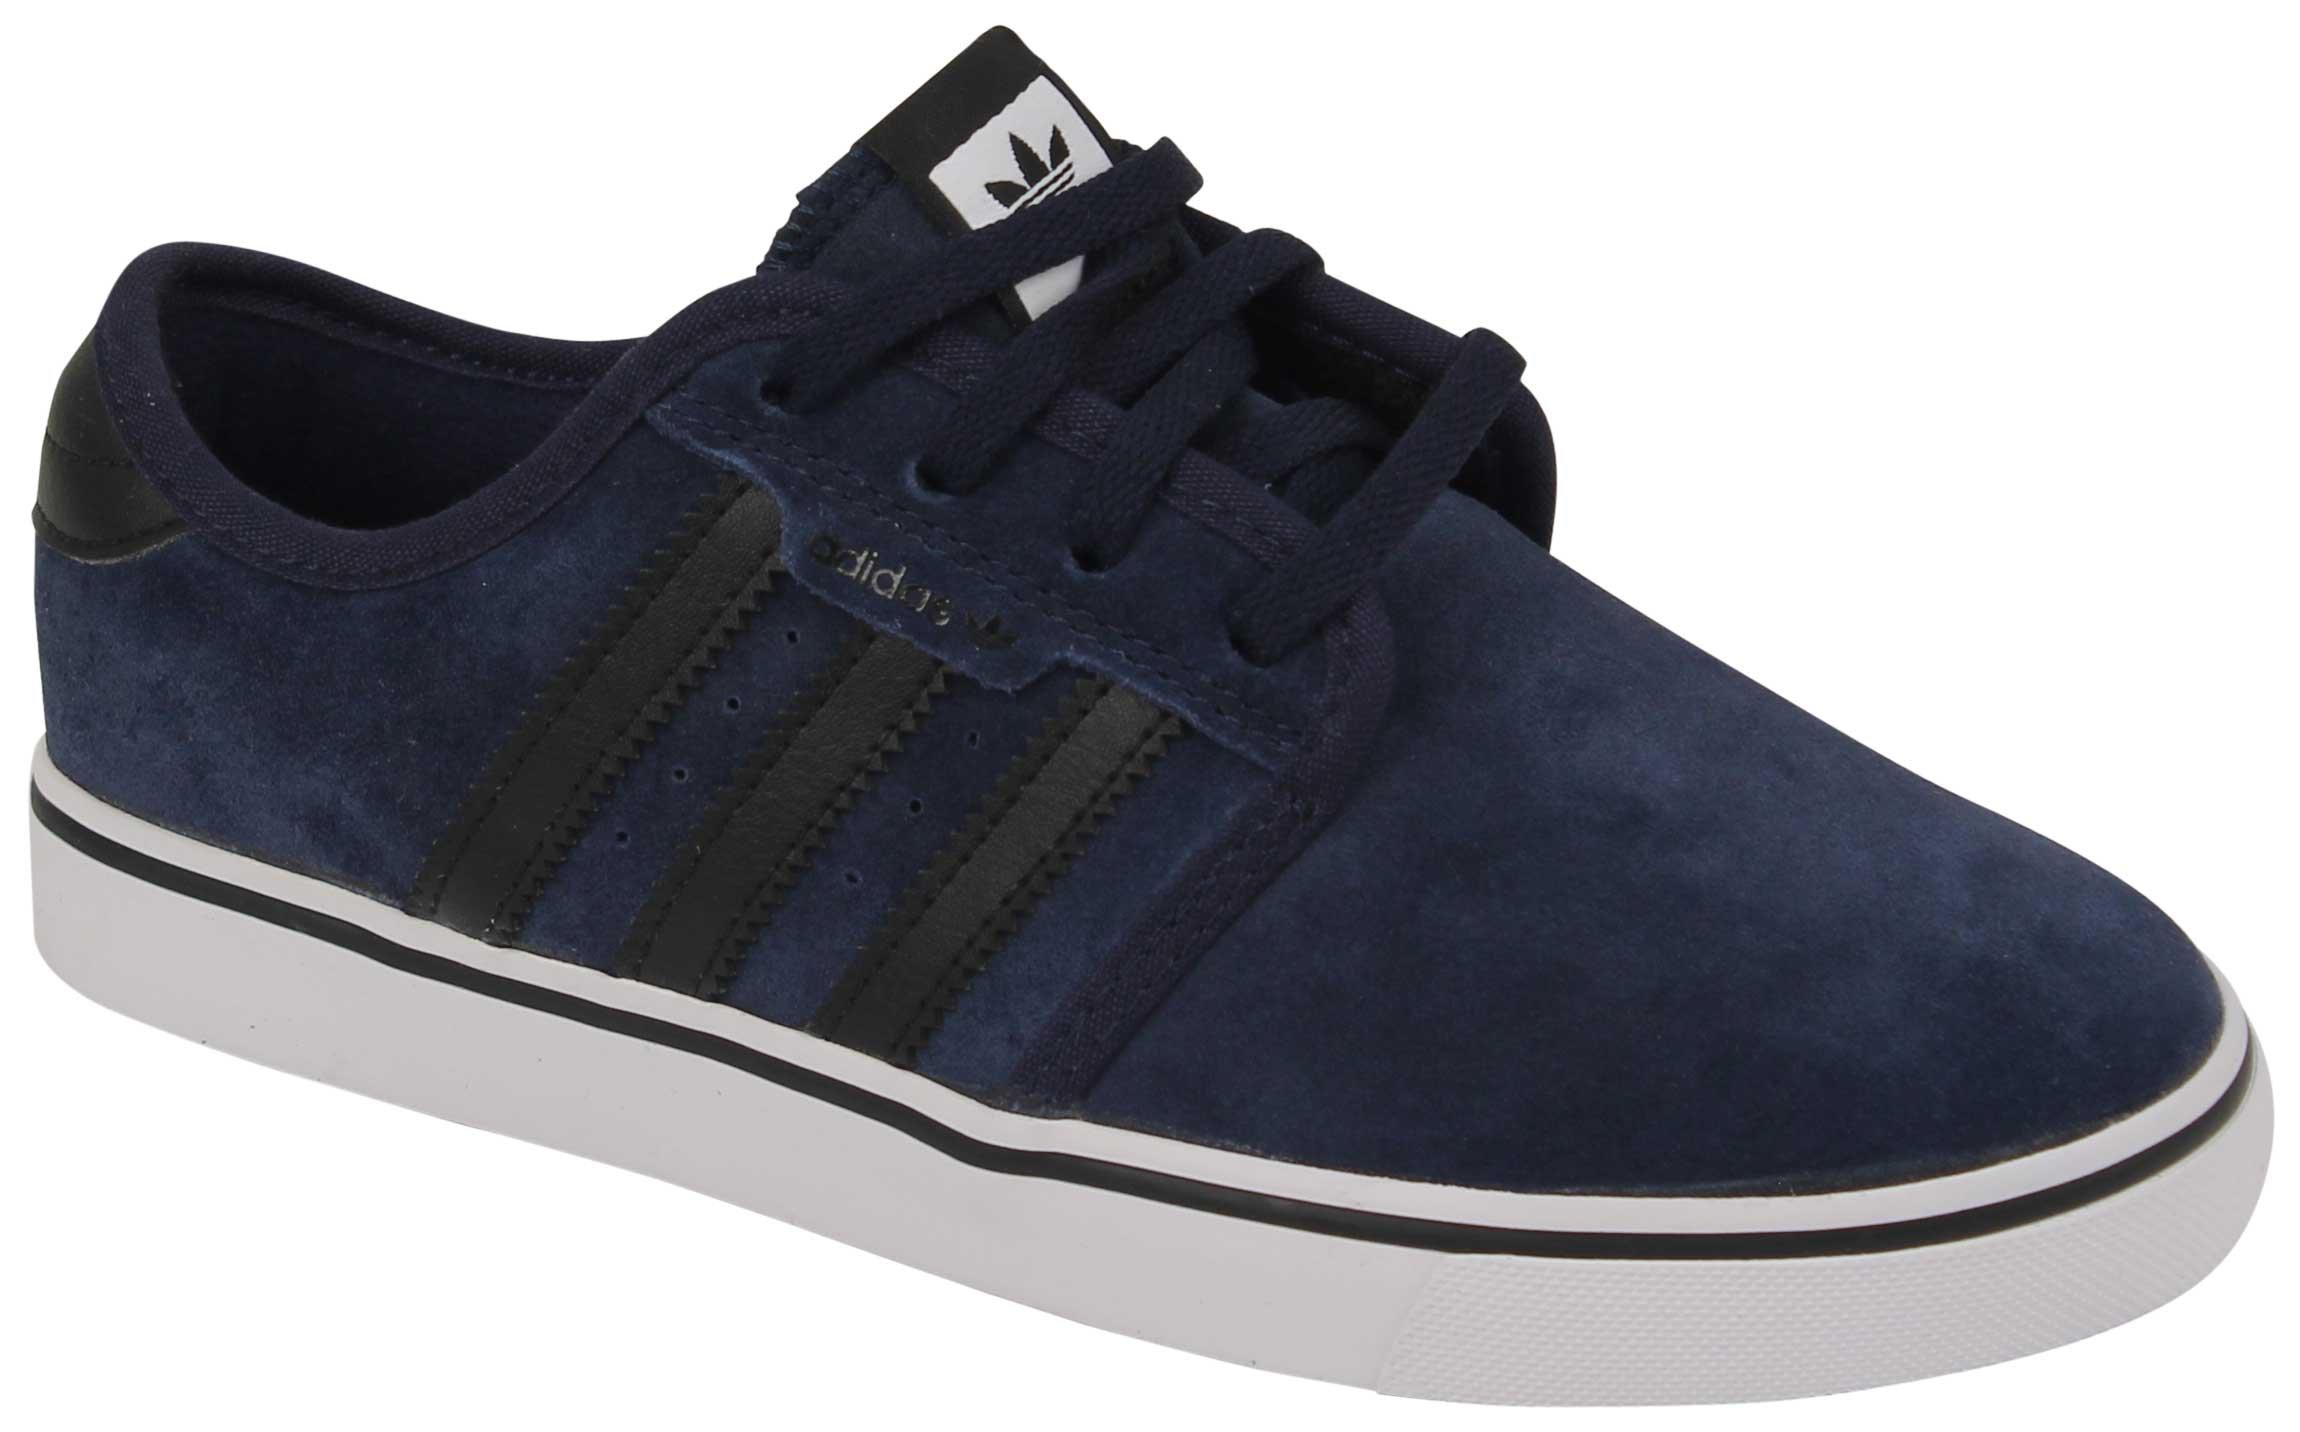 adidas Originals Boys' Seeley J-K Running Shoe, Collegiate Navy/Black/White, 13 M US Little Kid